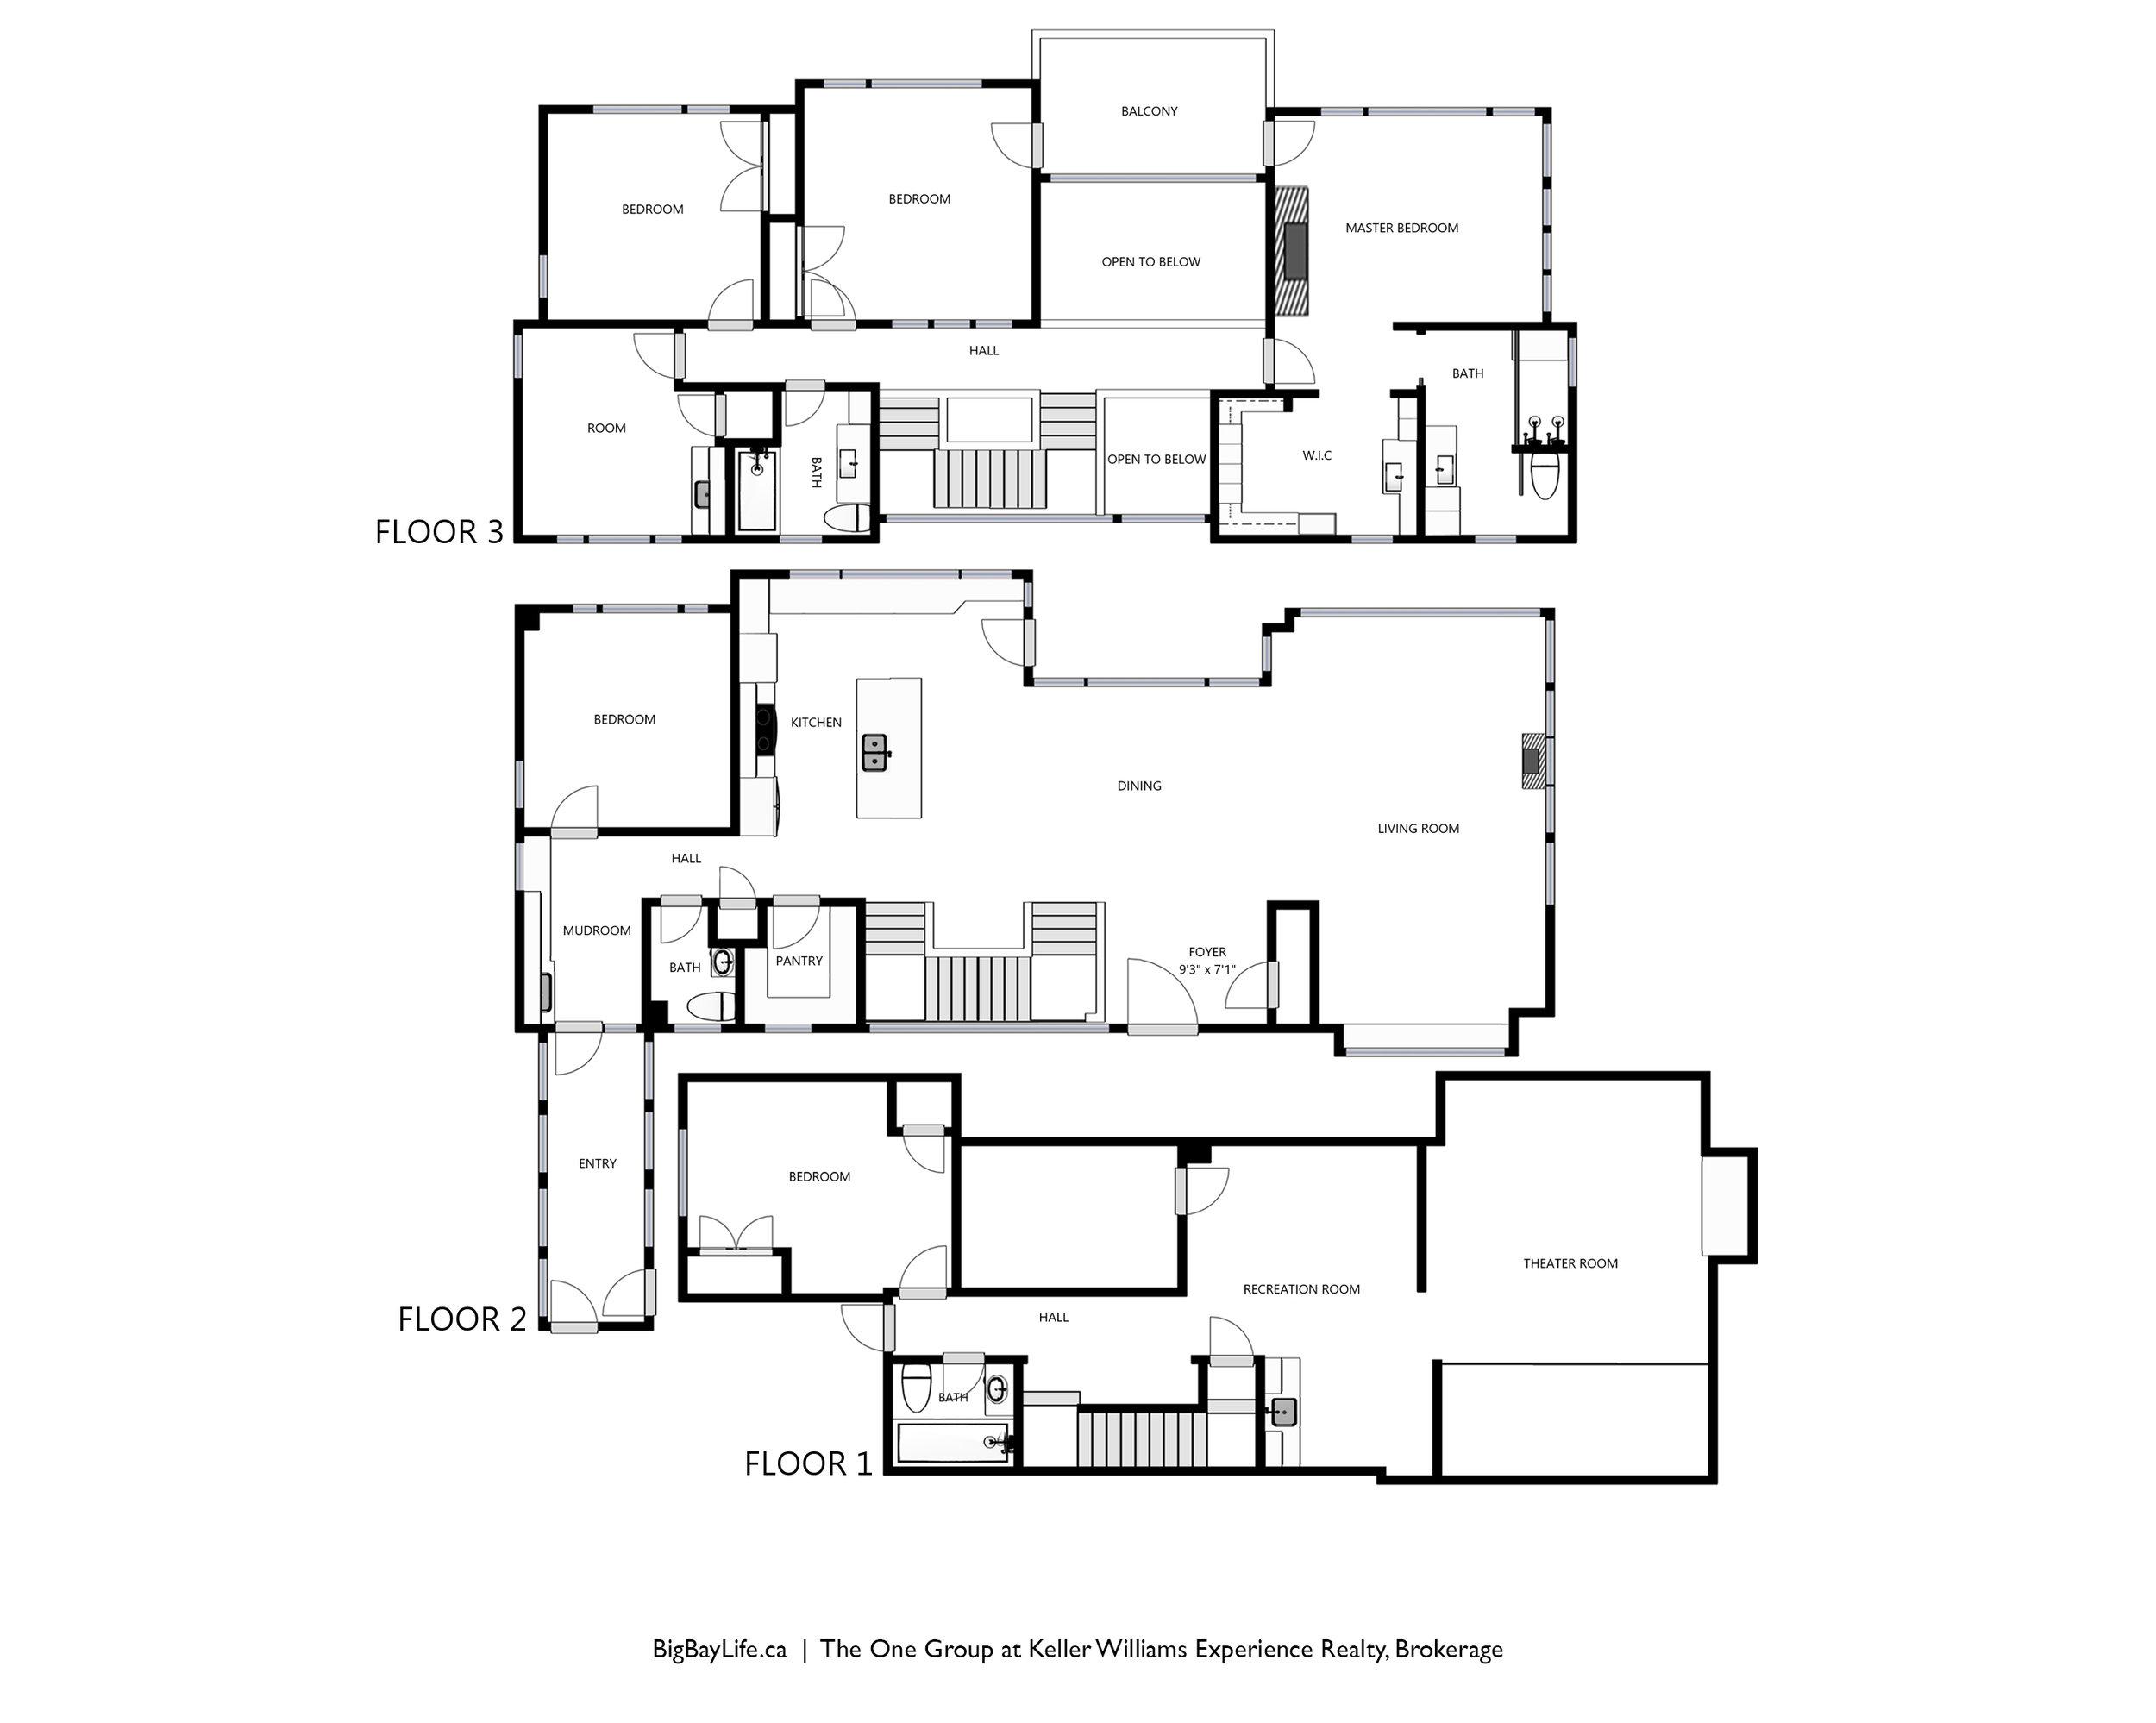 bigbaylife-theonegroup-floorplan.jpg